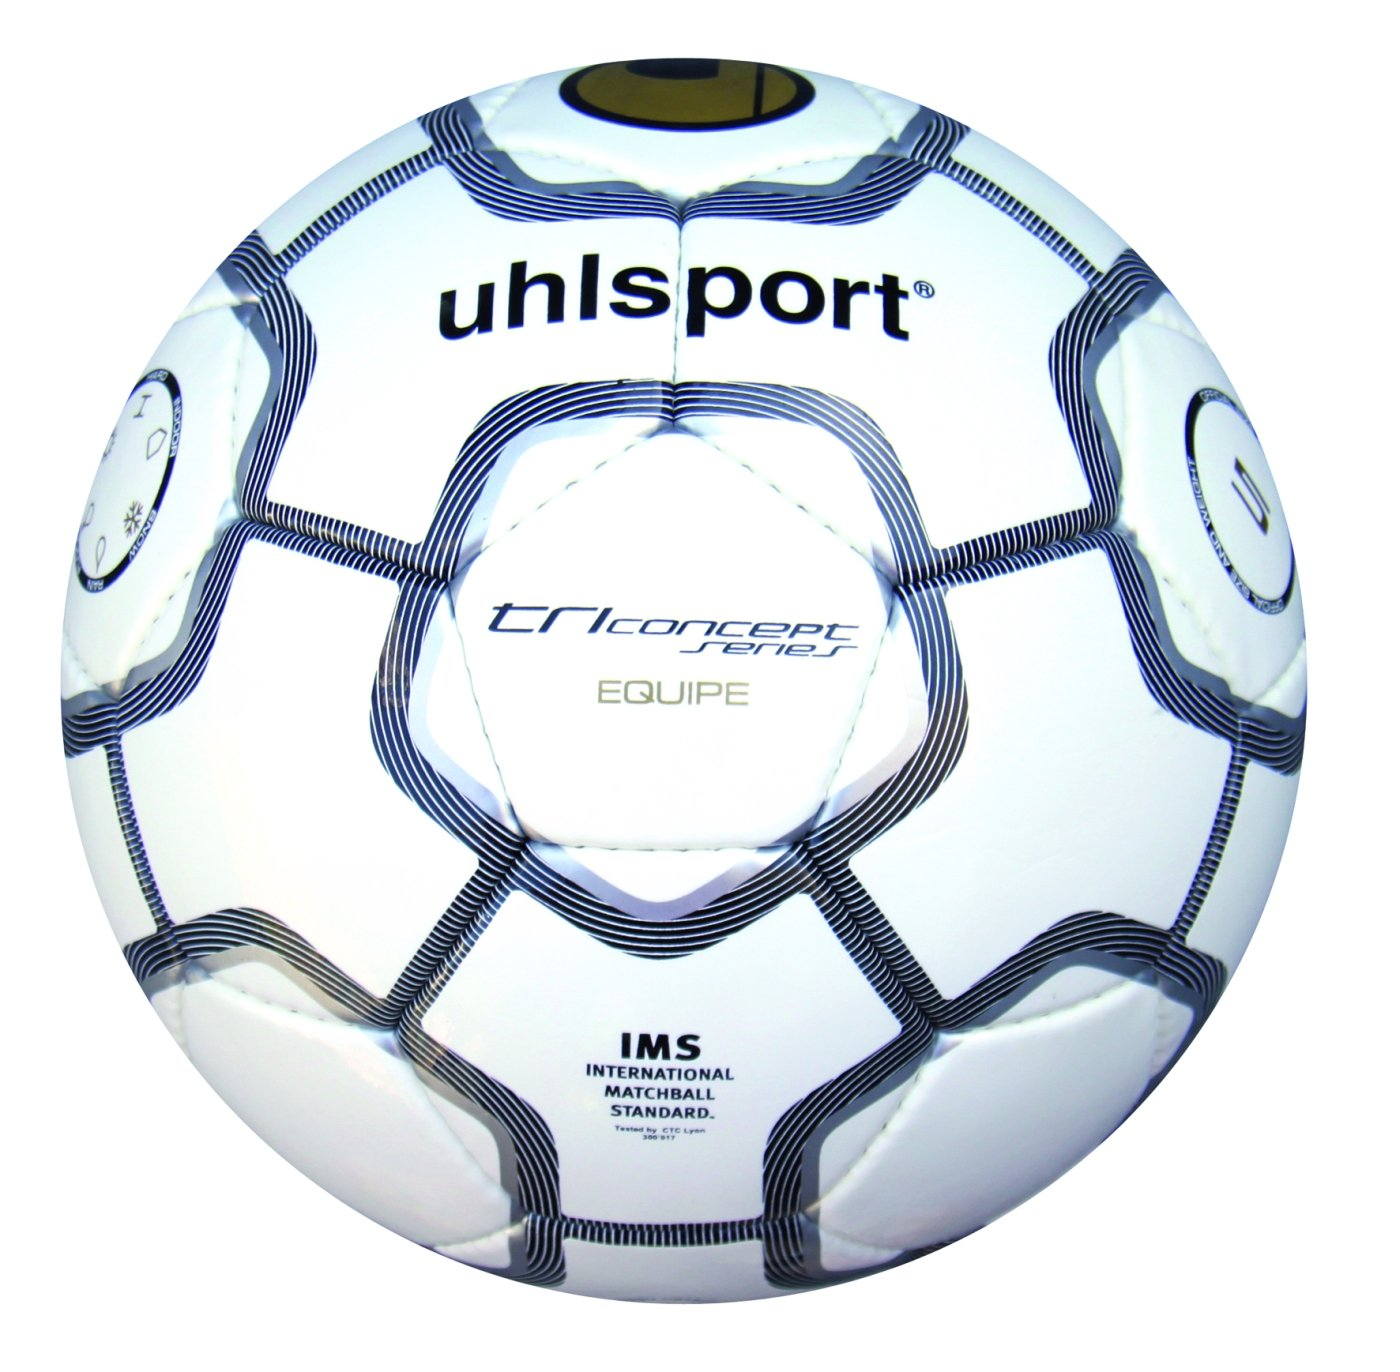 Uhlsport- TCPS Equipe, Pallone da calcio, Bianco/Nero/Argento, 5